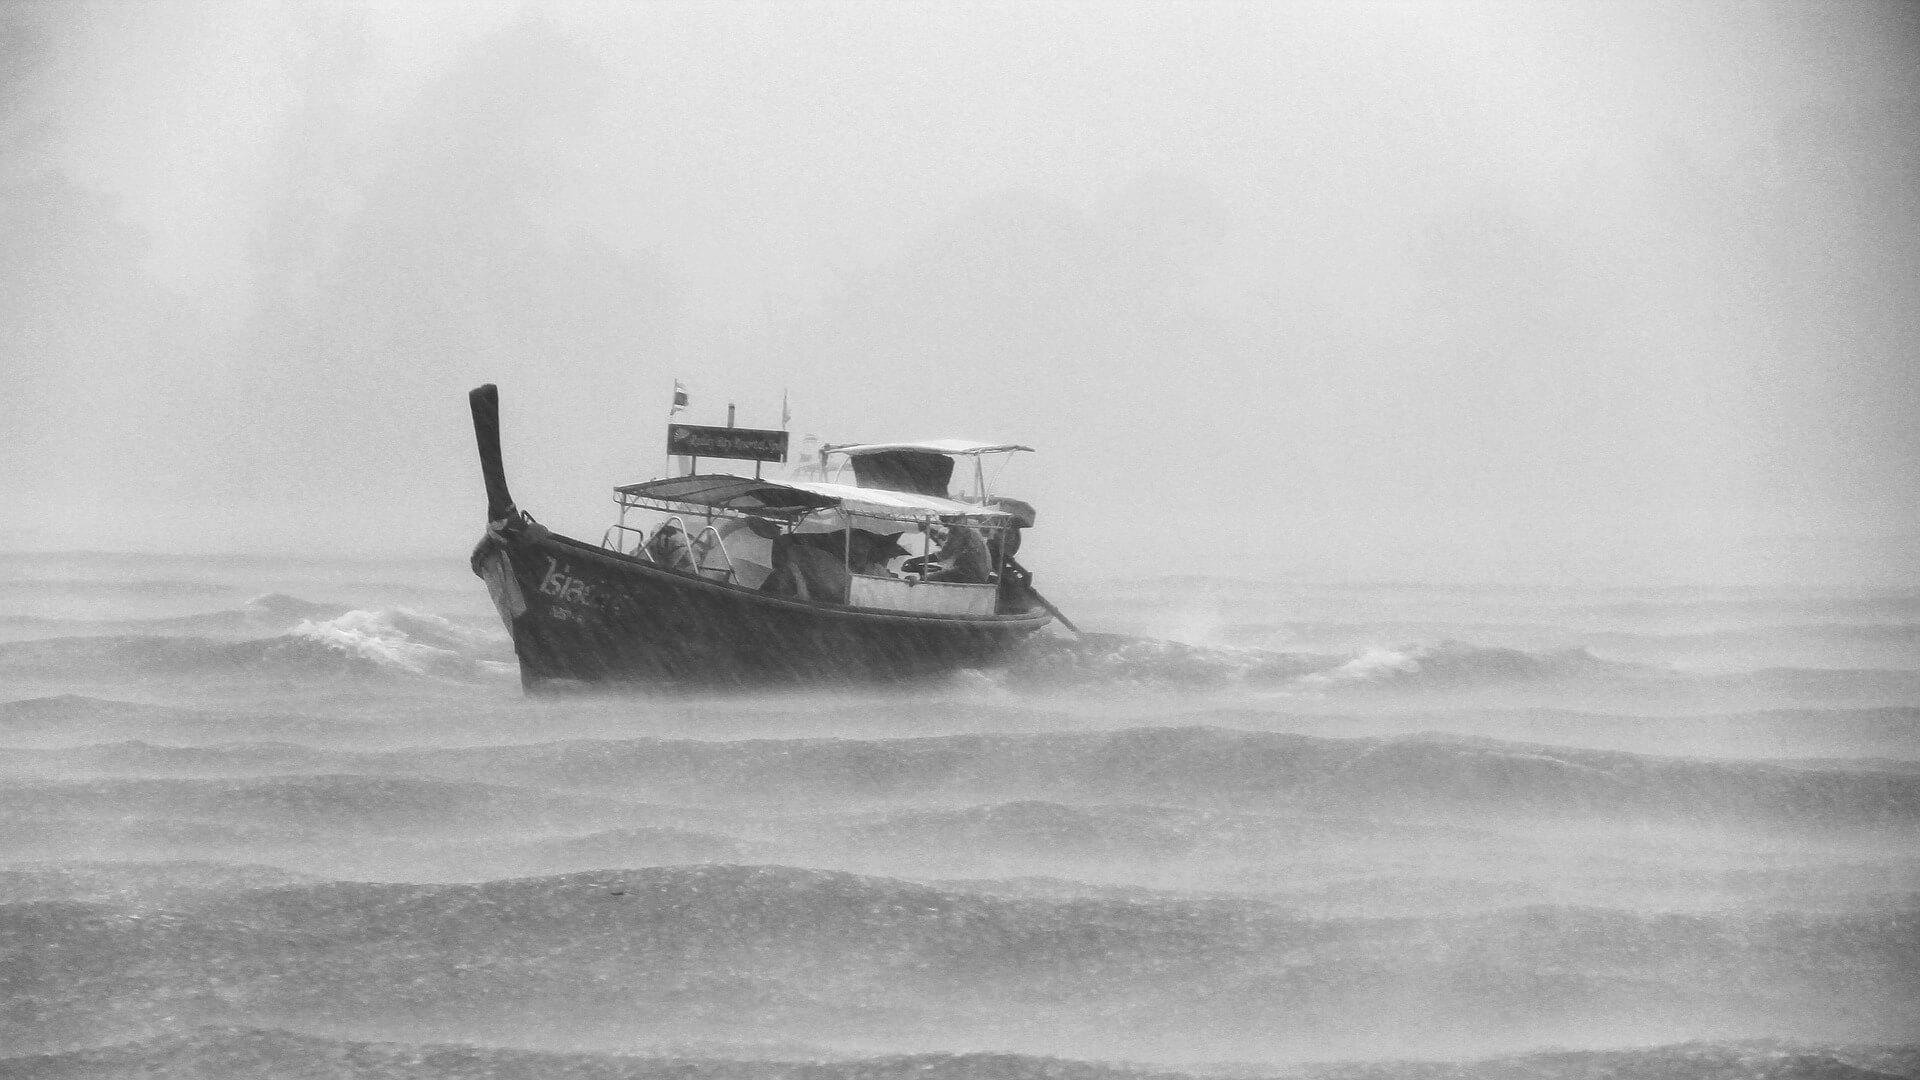 boat-962791_1920 (1).jpg